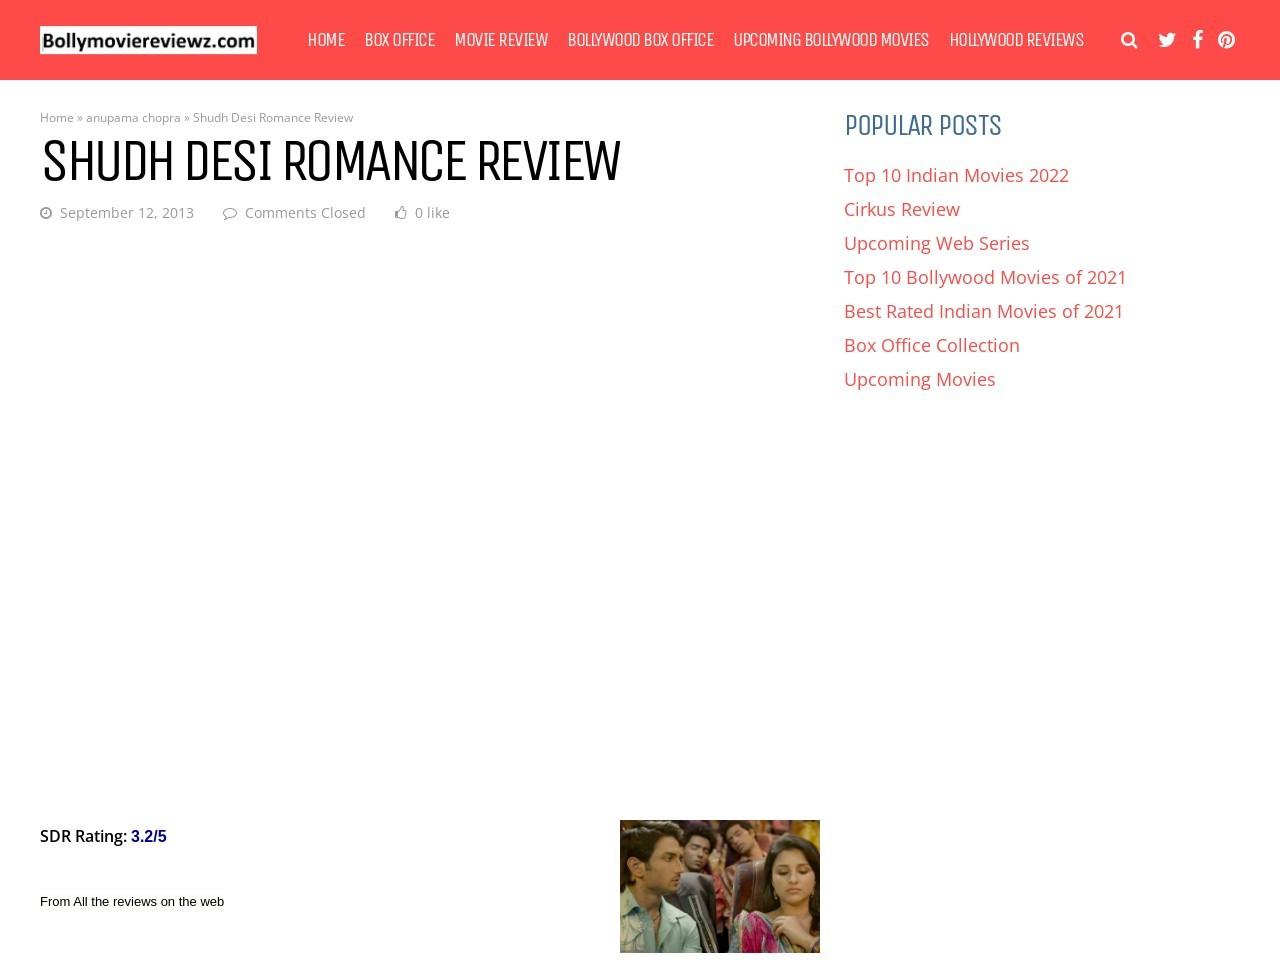 Shudh Desi Romance Review – Bollymoviereviewz